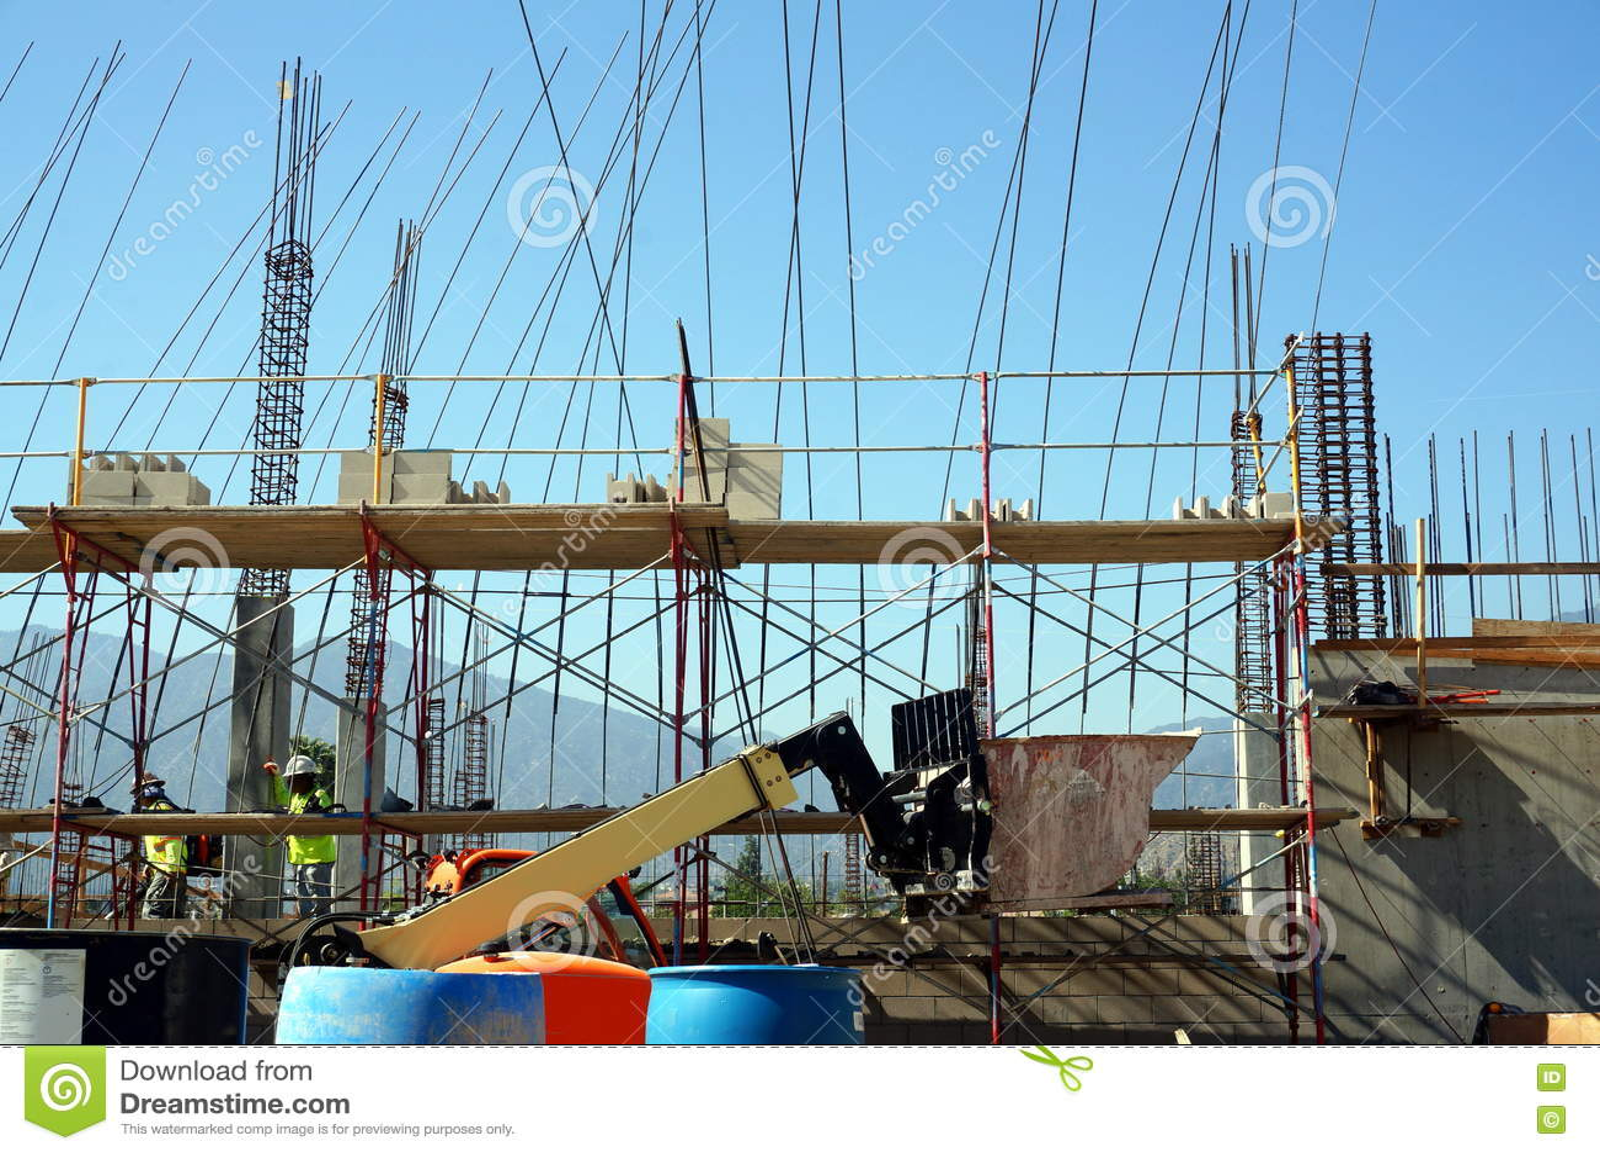 Download конструкция кирпичей кладя Outdoors место Стоковое Фото - изображение насчитывающей туша, fitments: 72289284